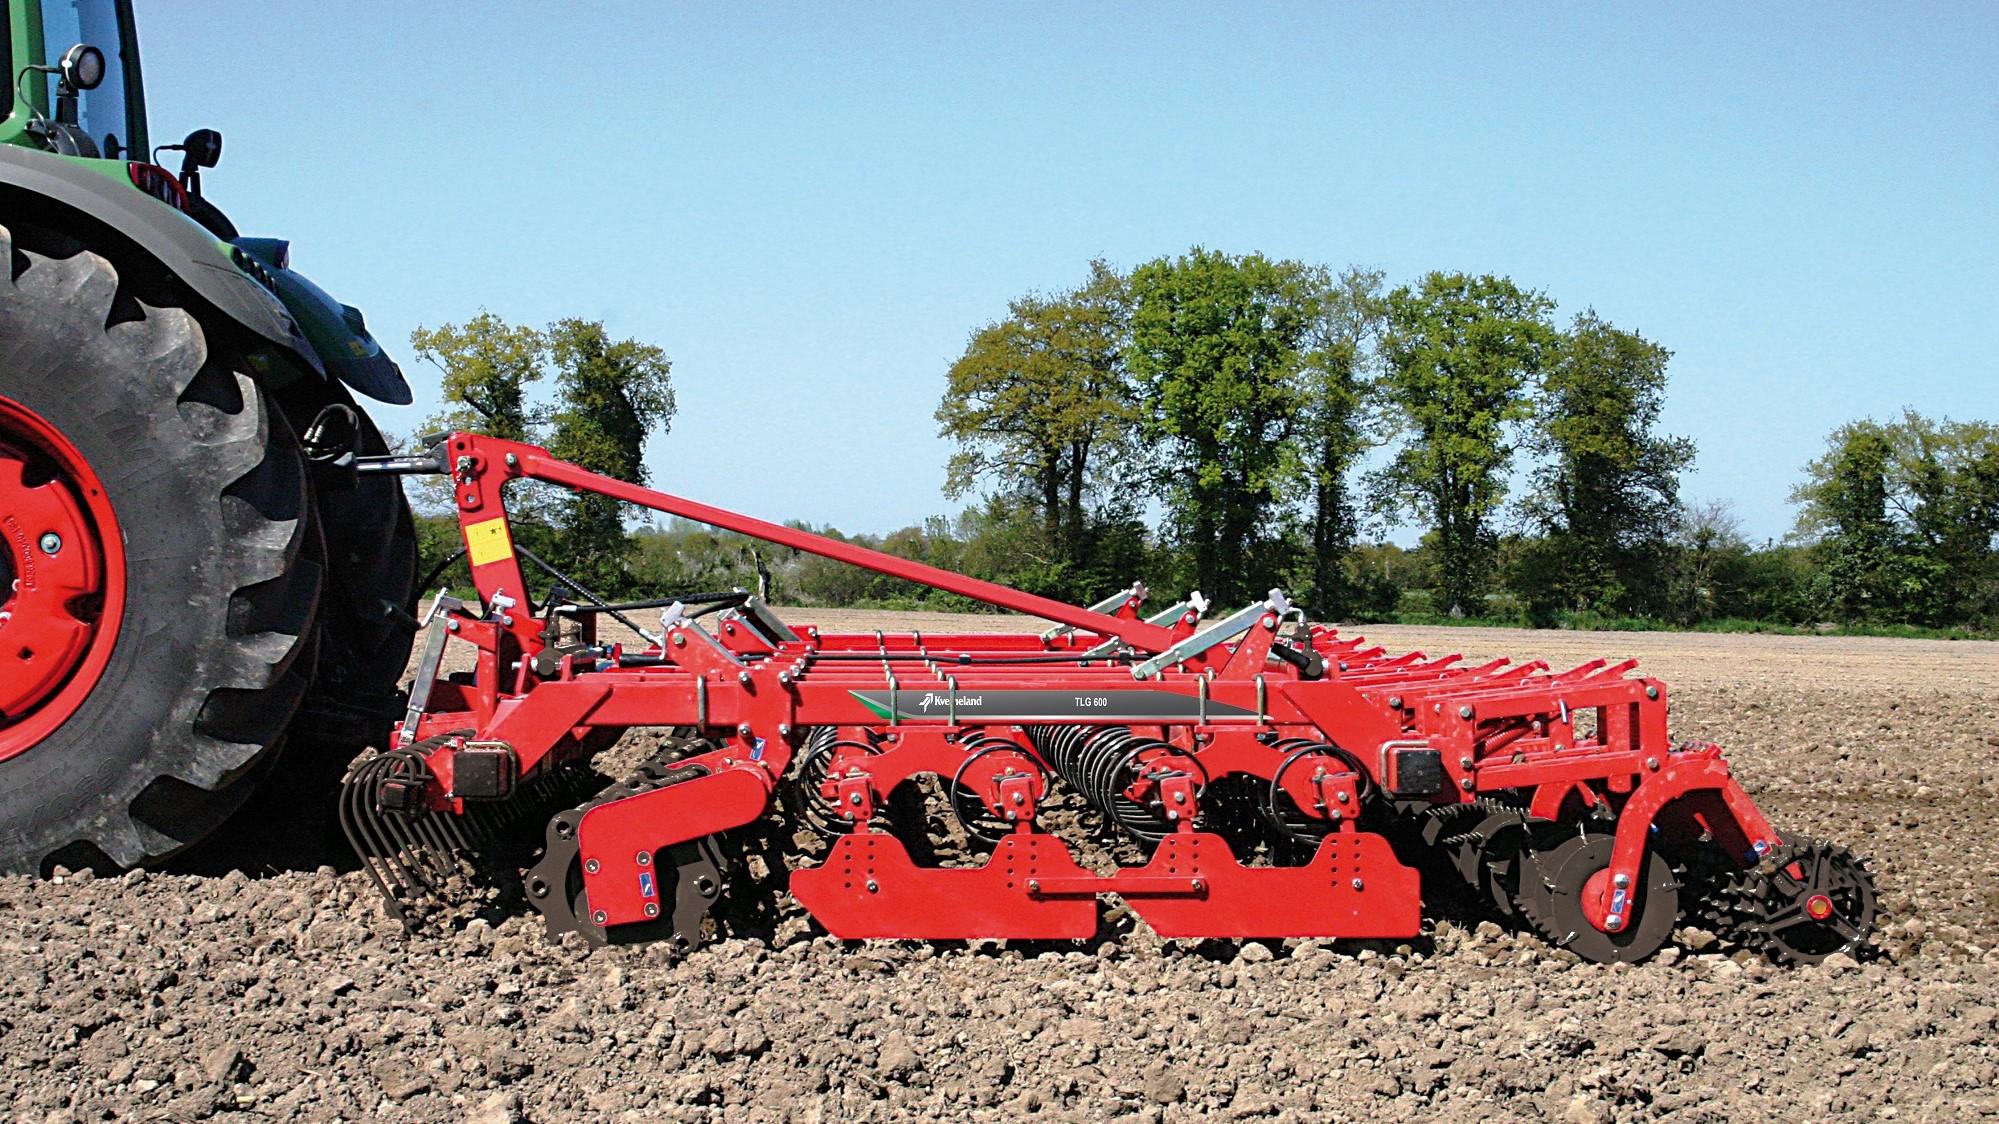 Kverneland ha una gamma di vibrocoltivatori ad alta resa qualitativa